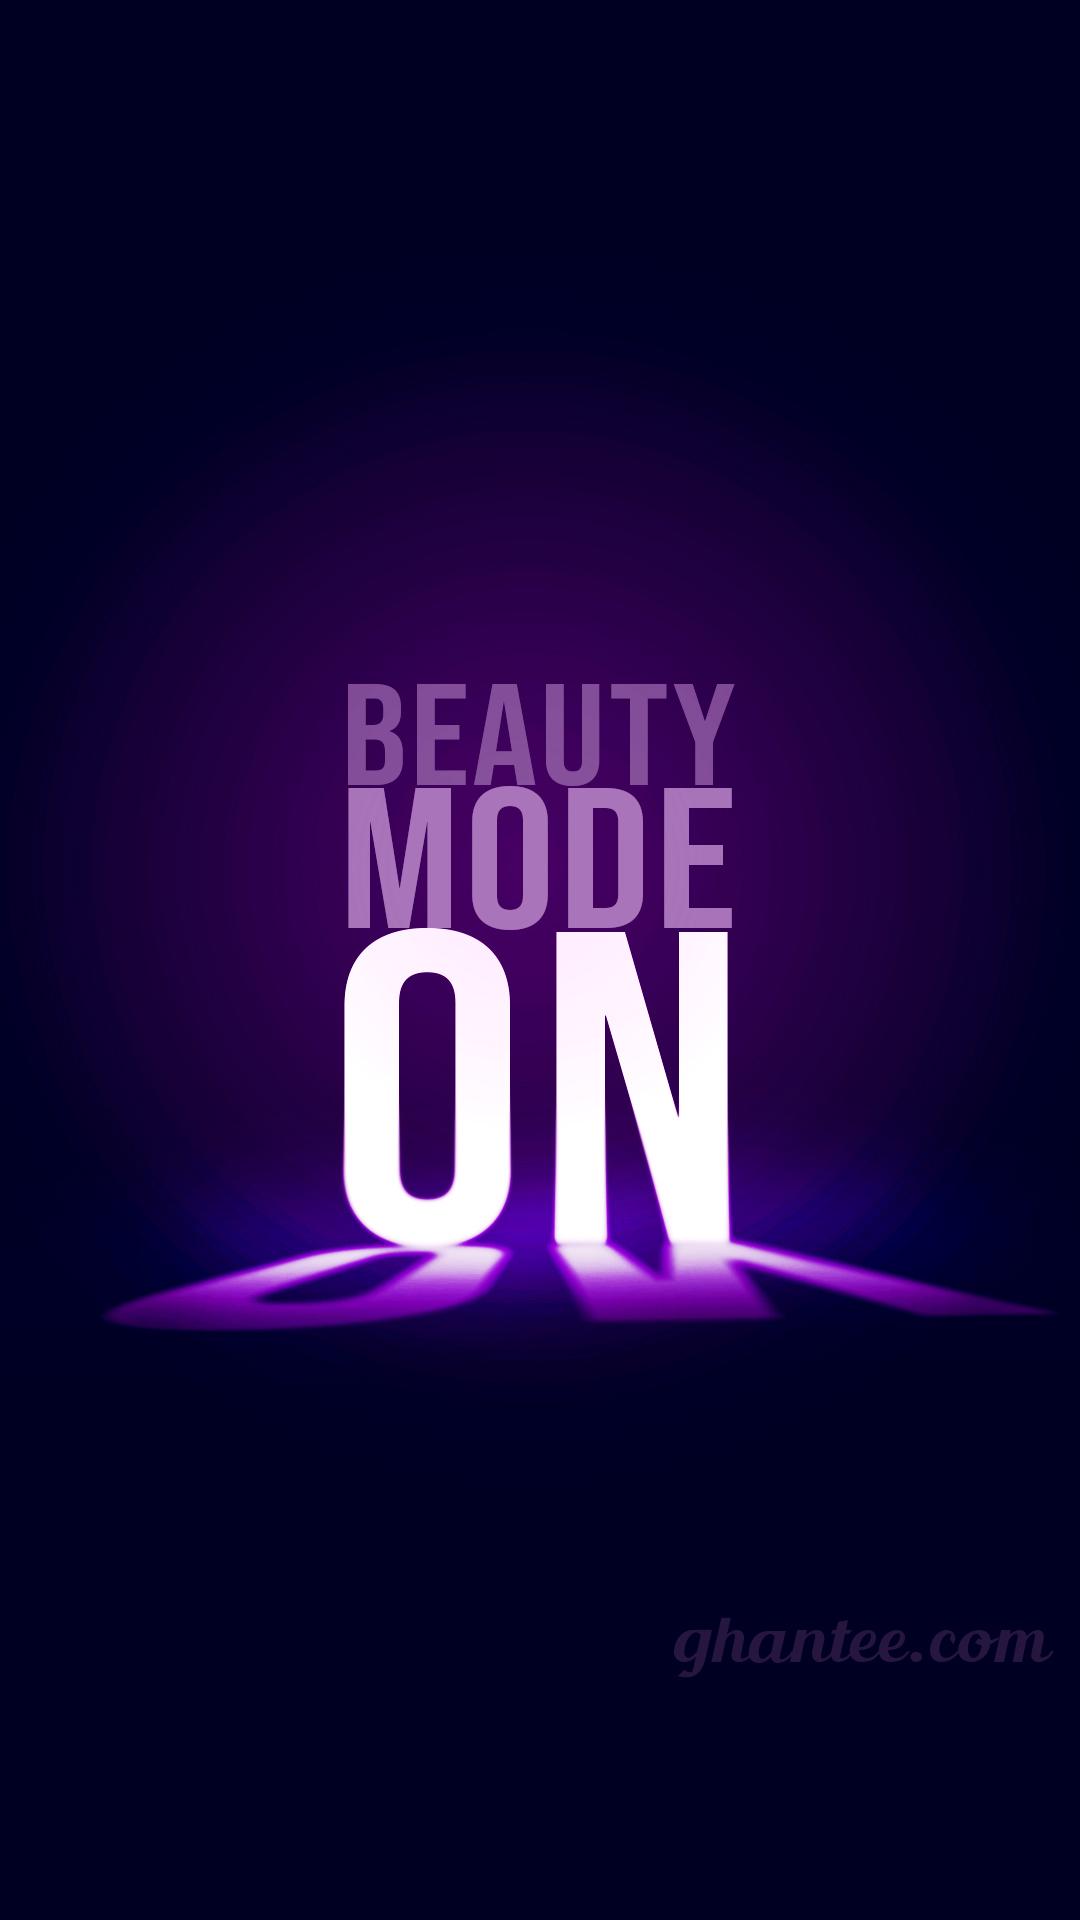 beauty mode on hd phone wallpaper for girls